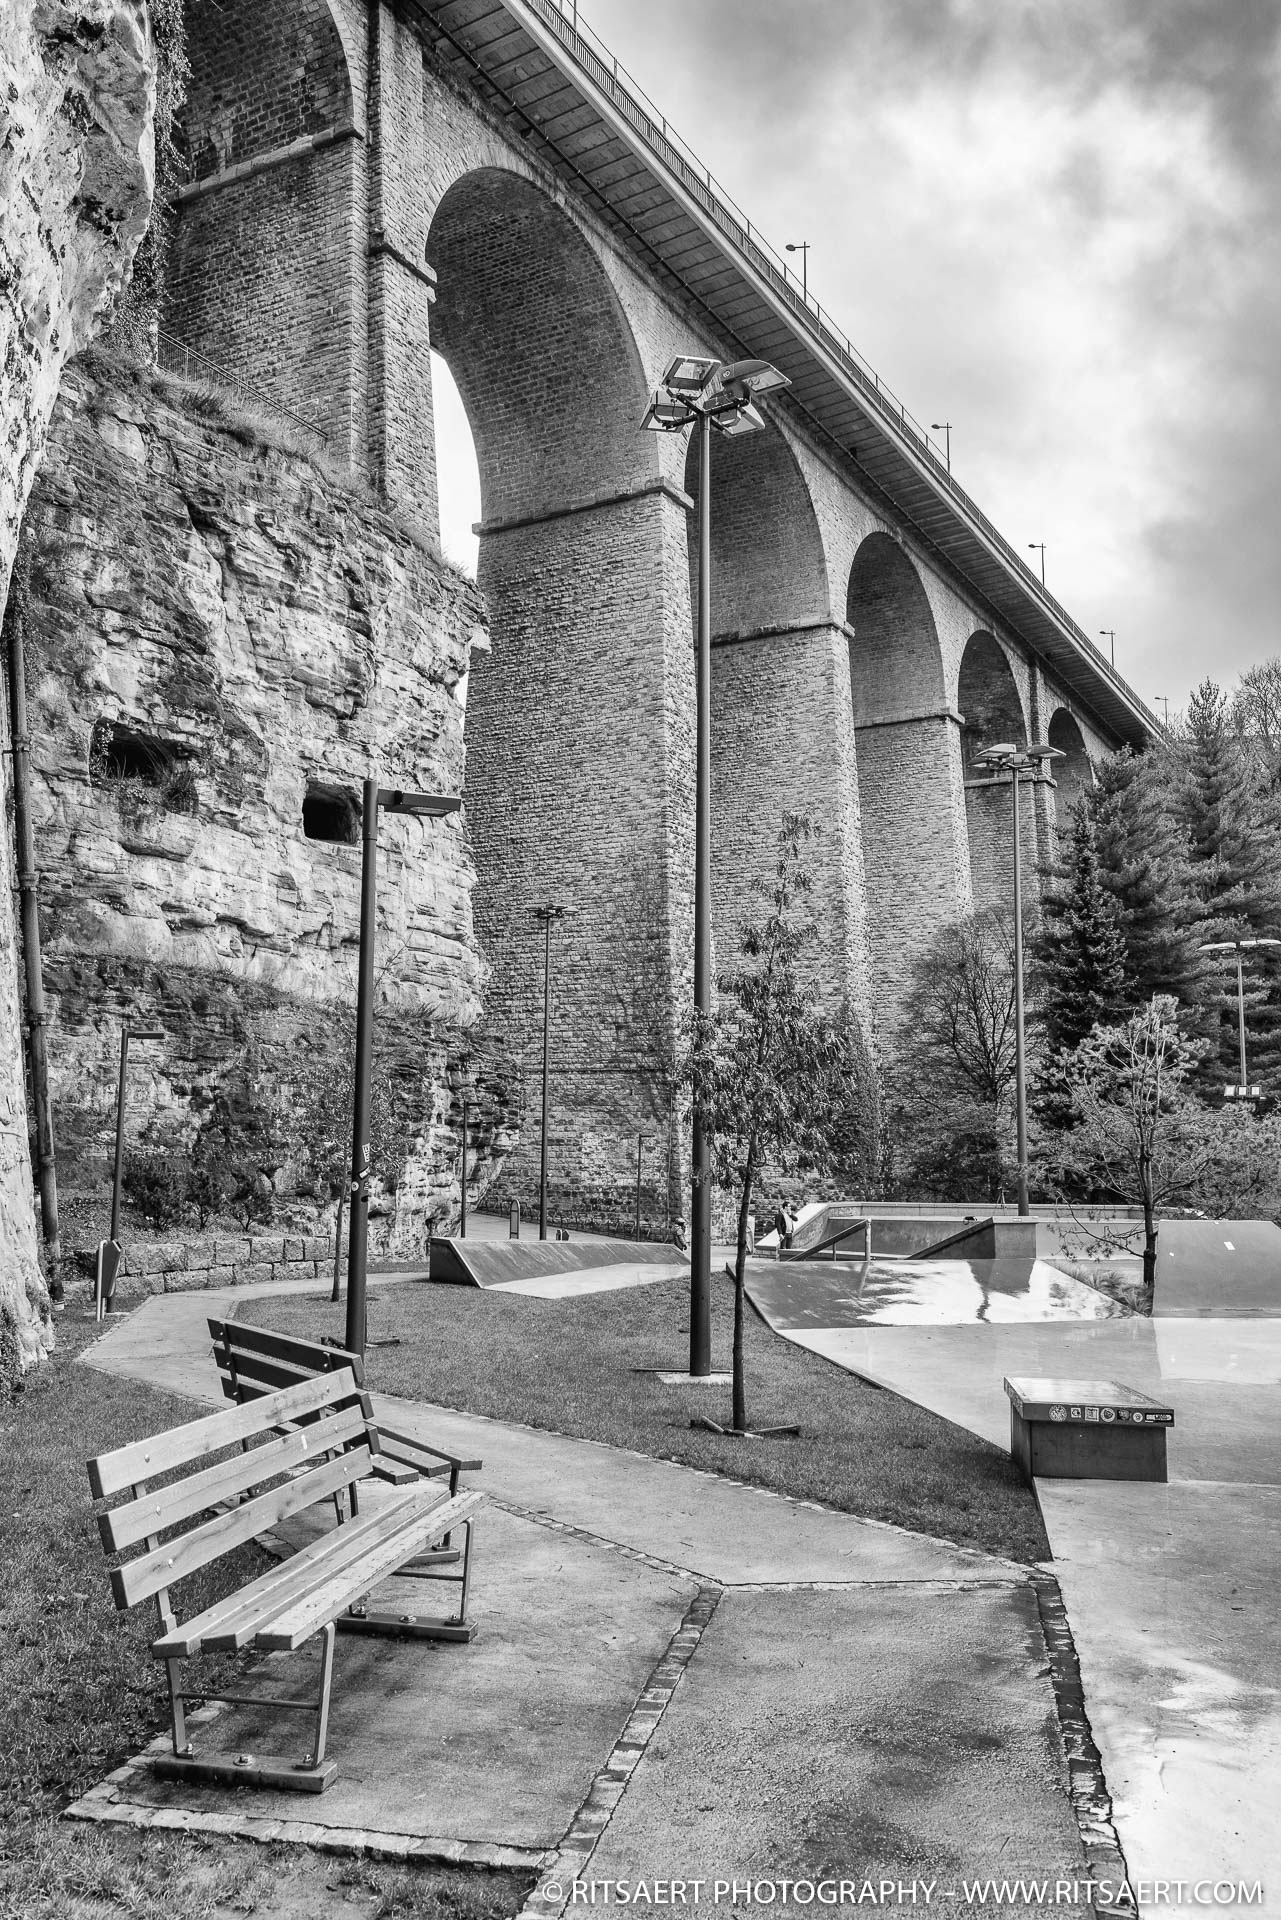 Bridge - Luxembourg city - Luxembourg